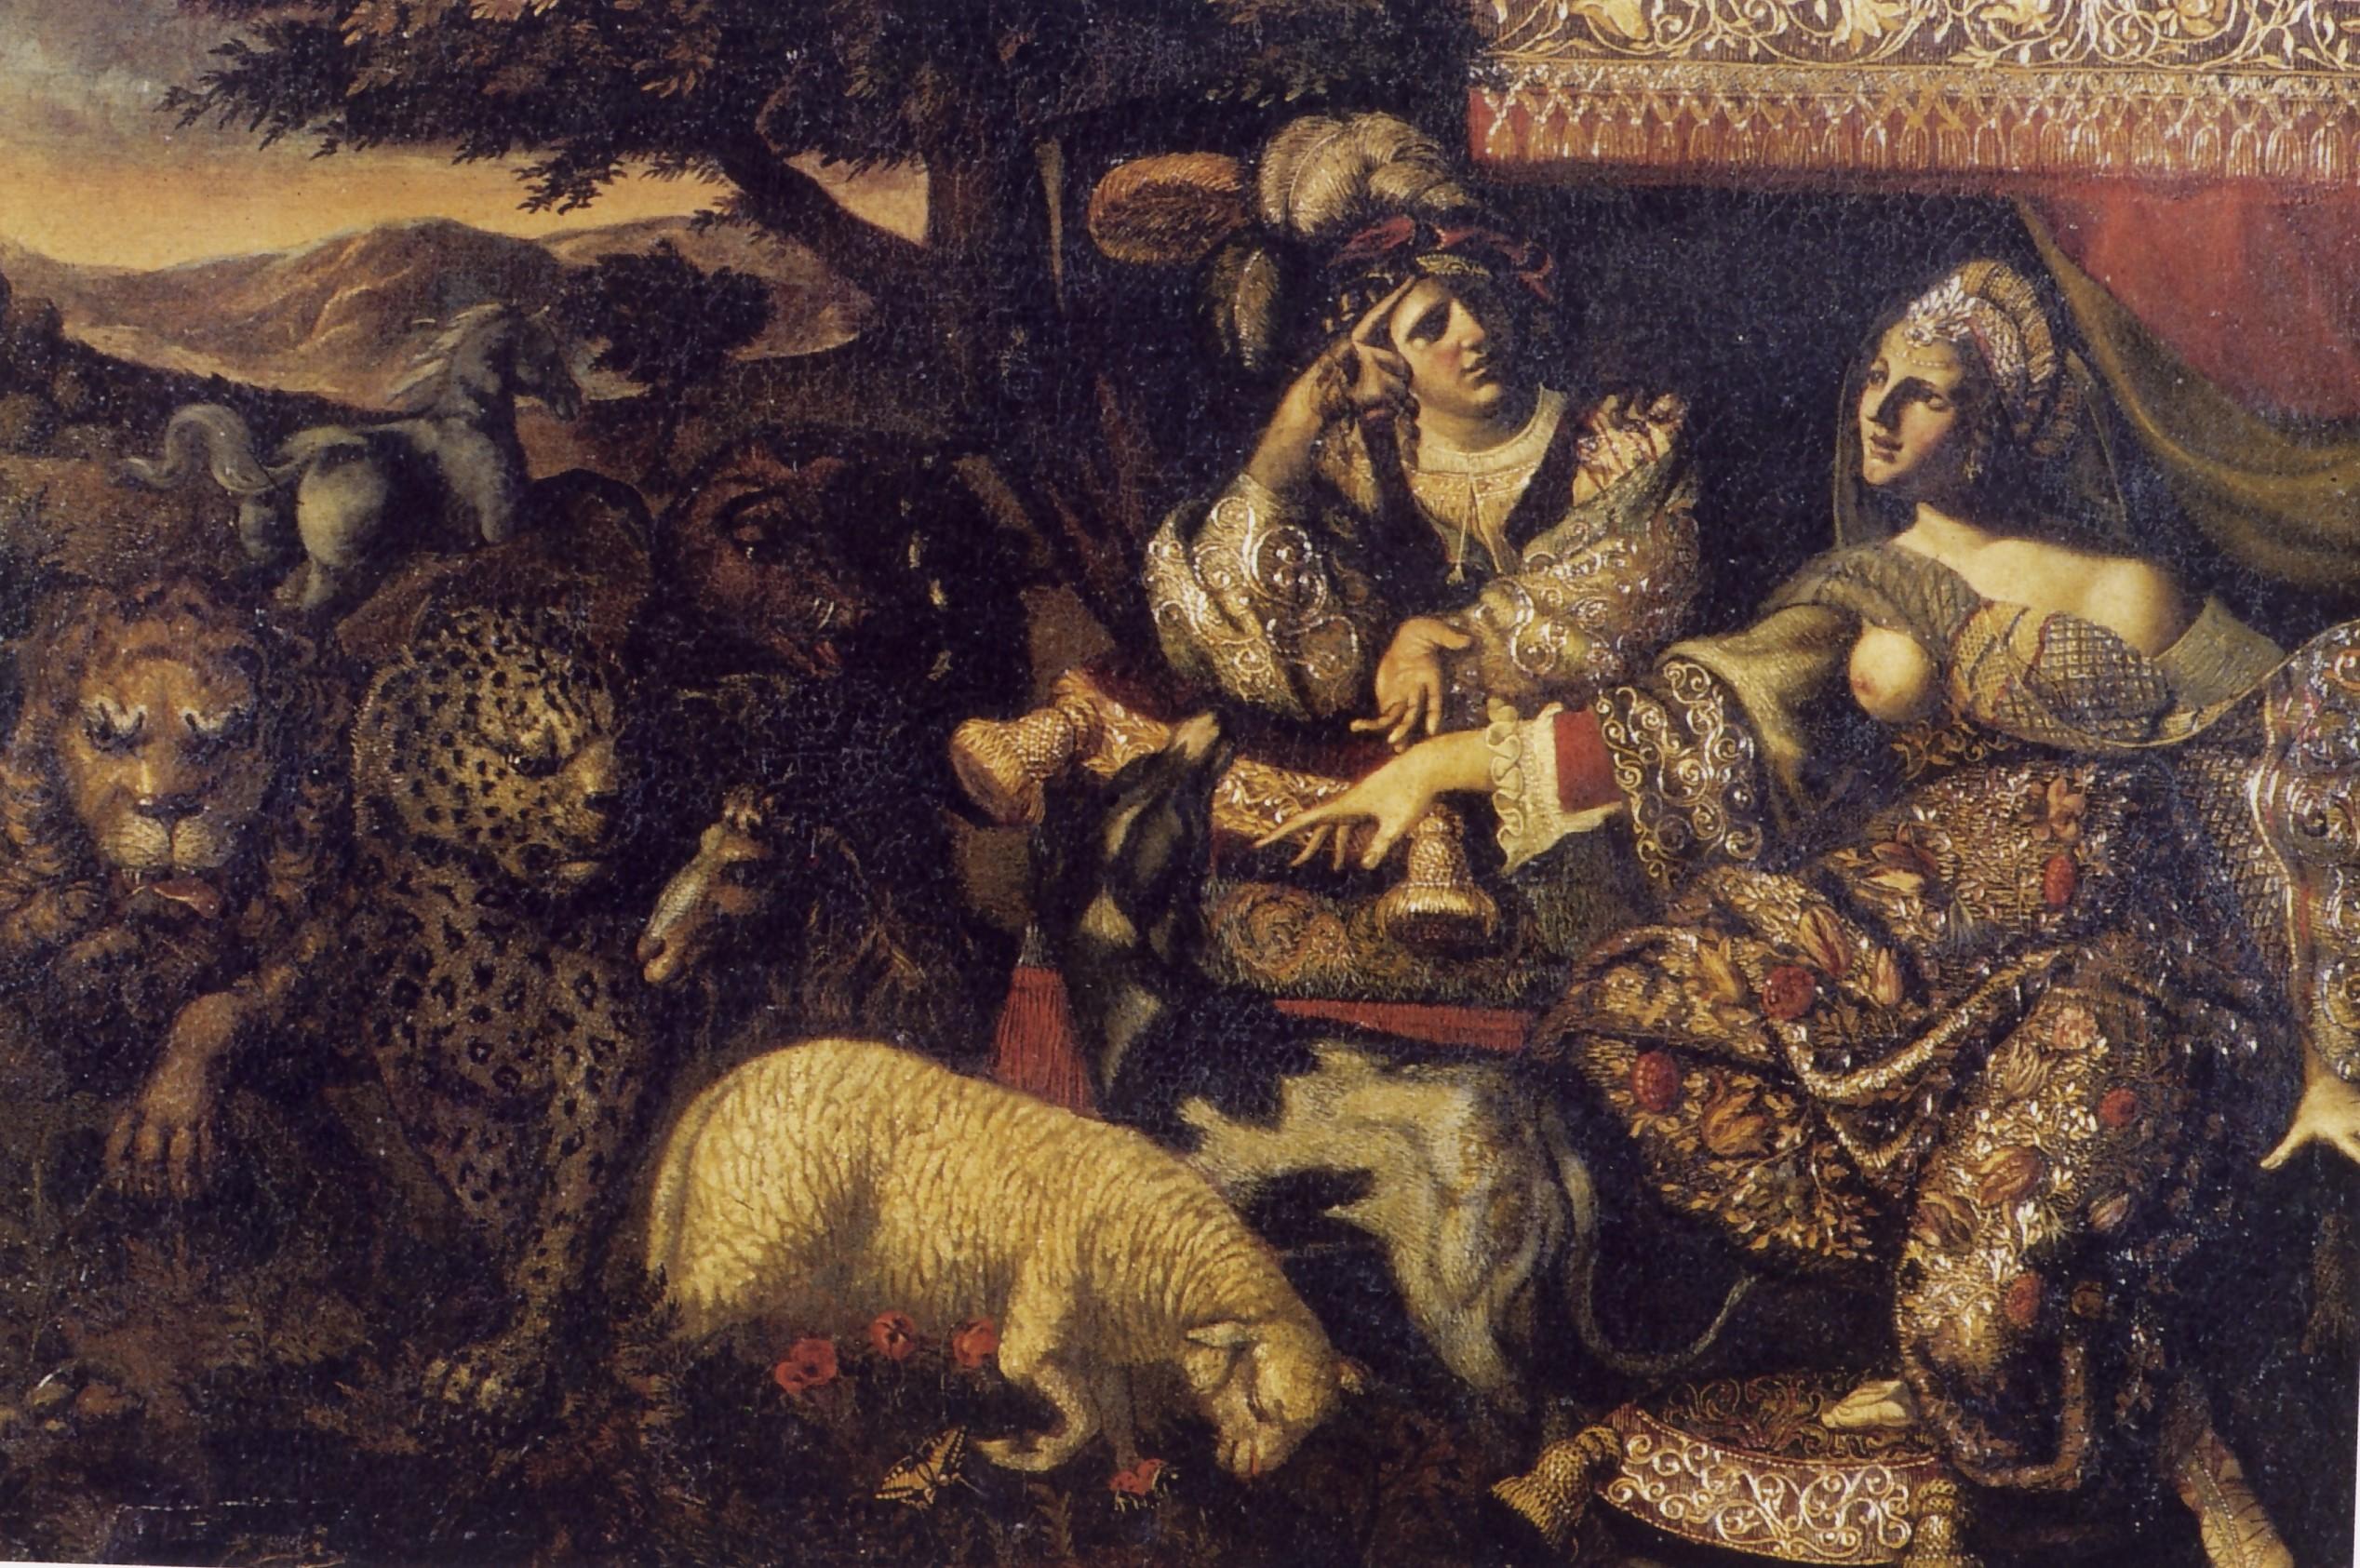 Angelo Caroselli, La maga, secolo XVII, Museo statale d'arte medievale e moderna